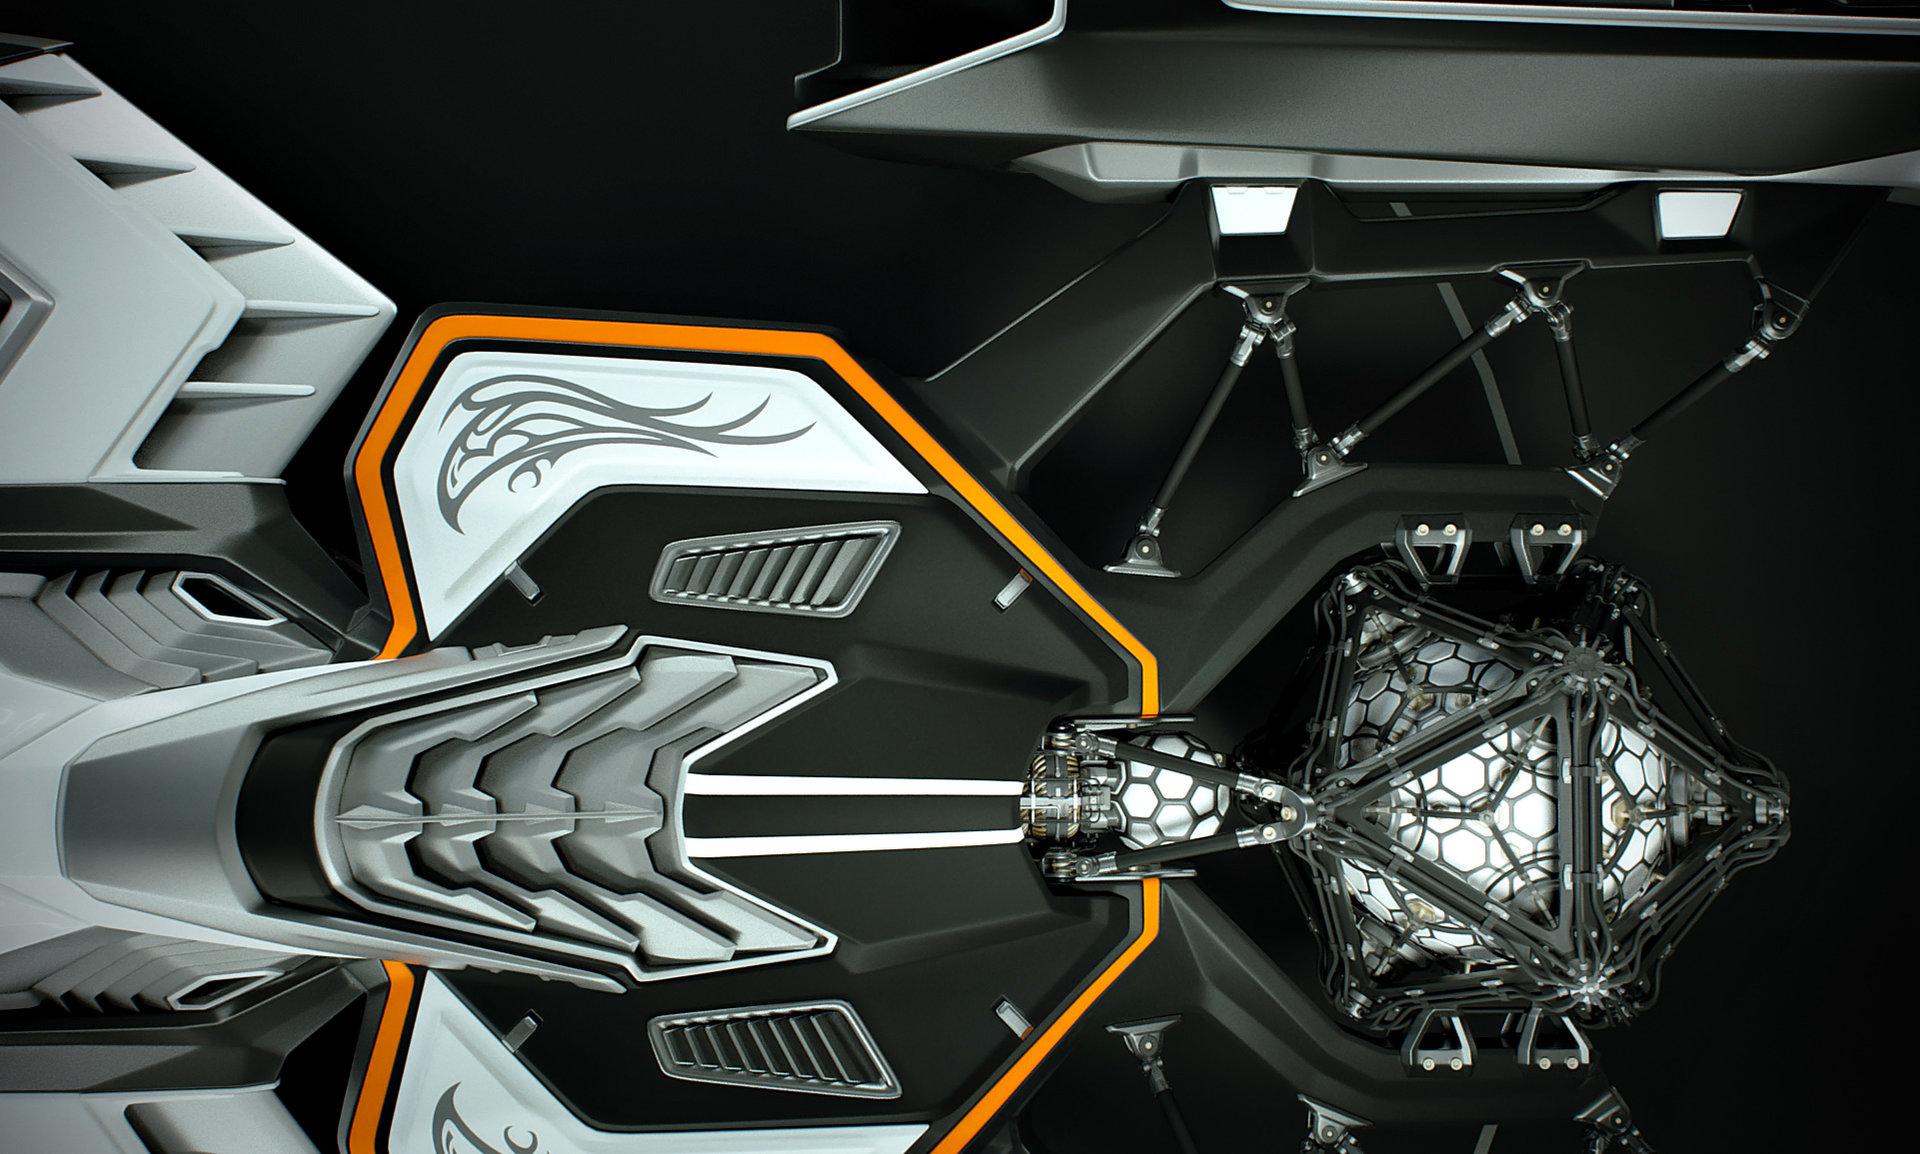 Johan de leenheer 3d spaceship faucer fuga mx230e 14